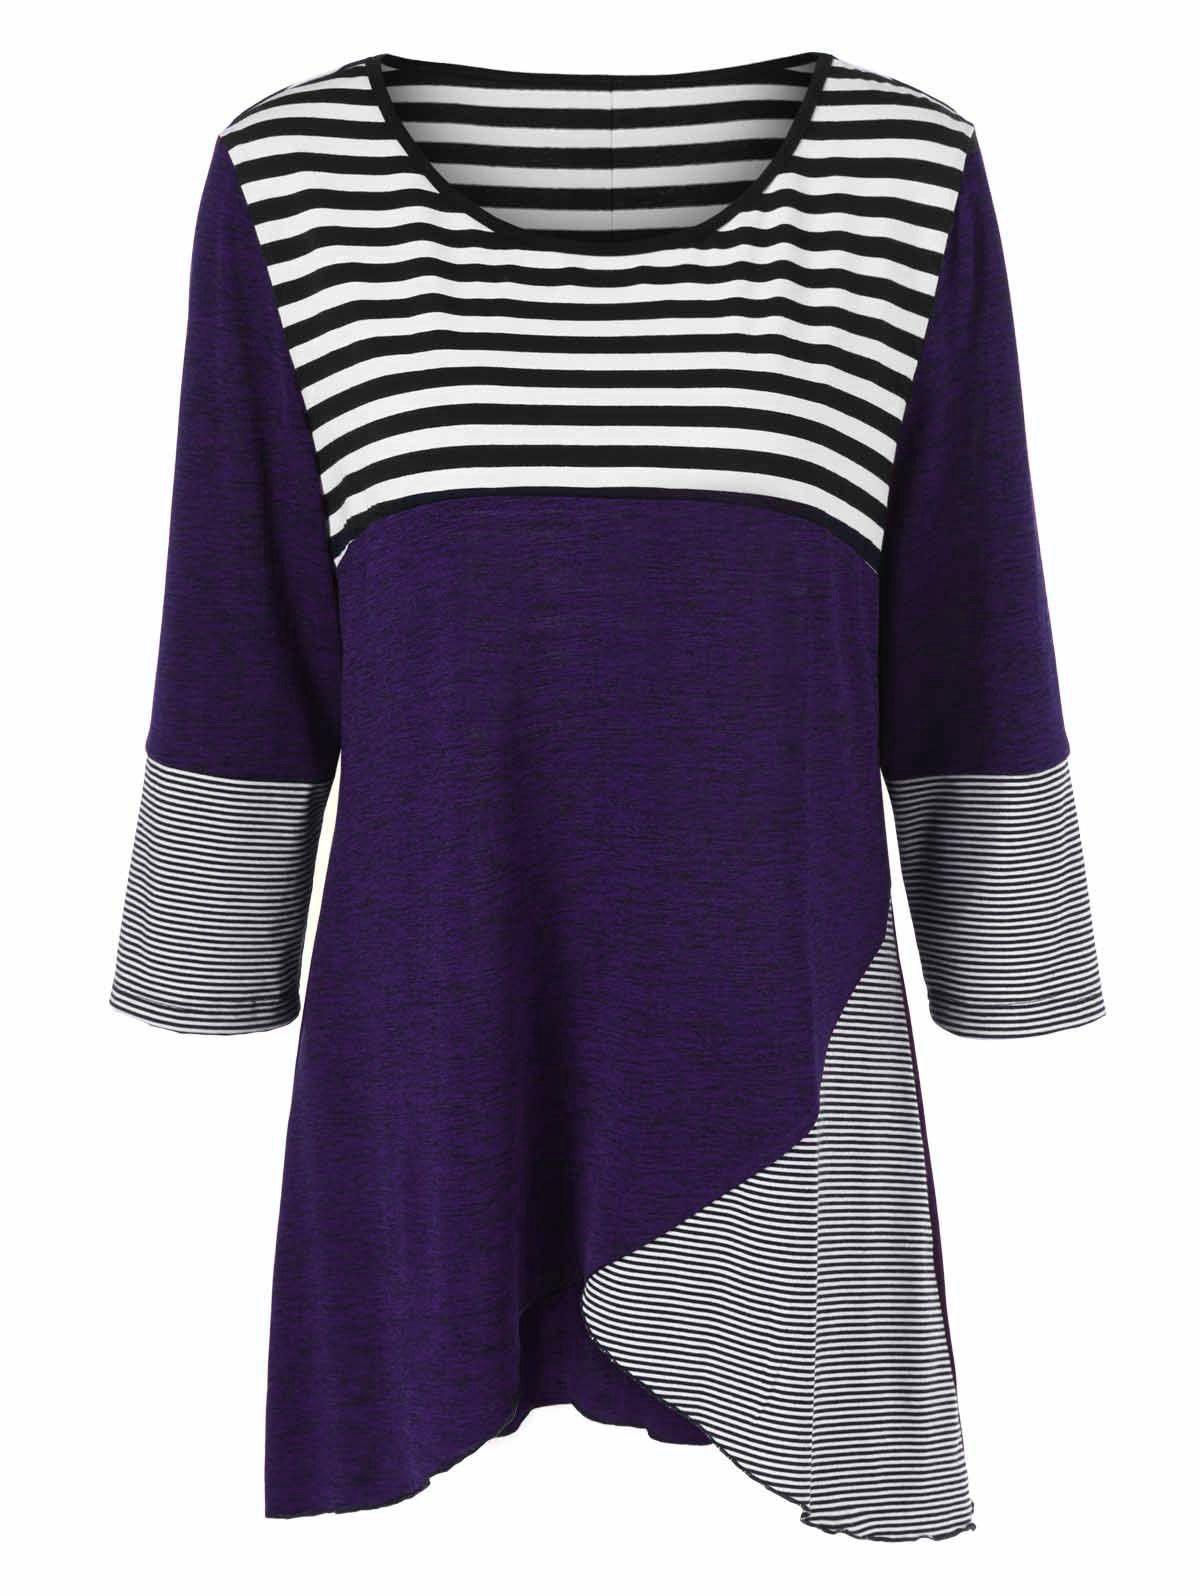 $6.66 Striped Tunic T-Shirt